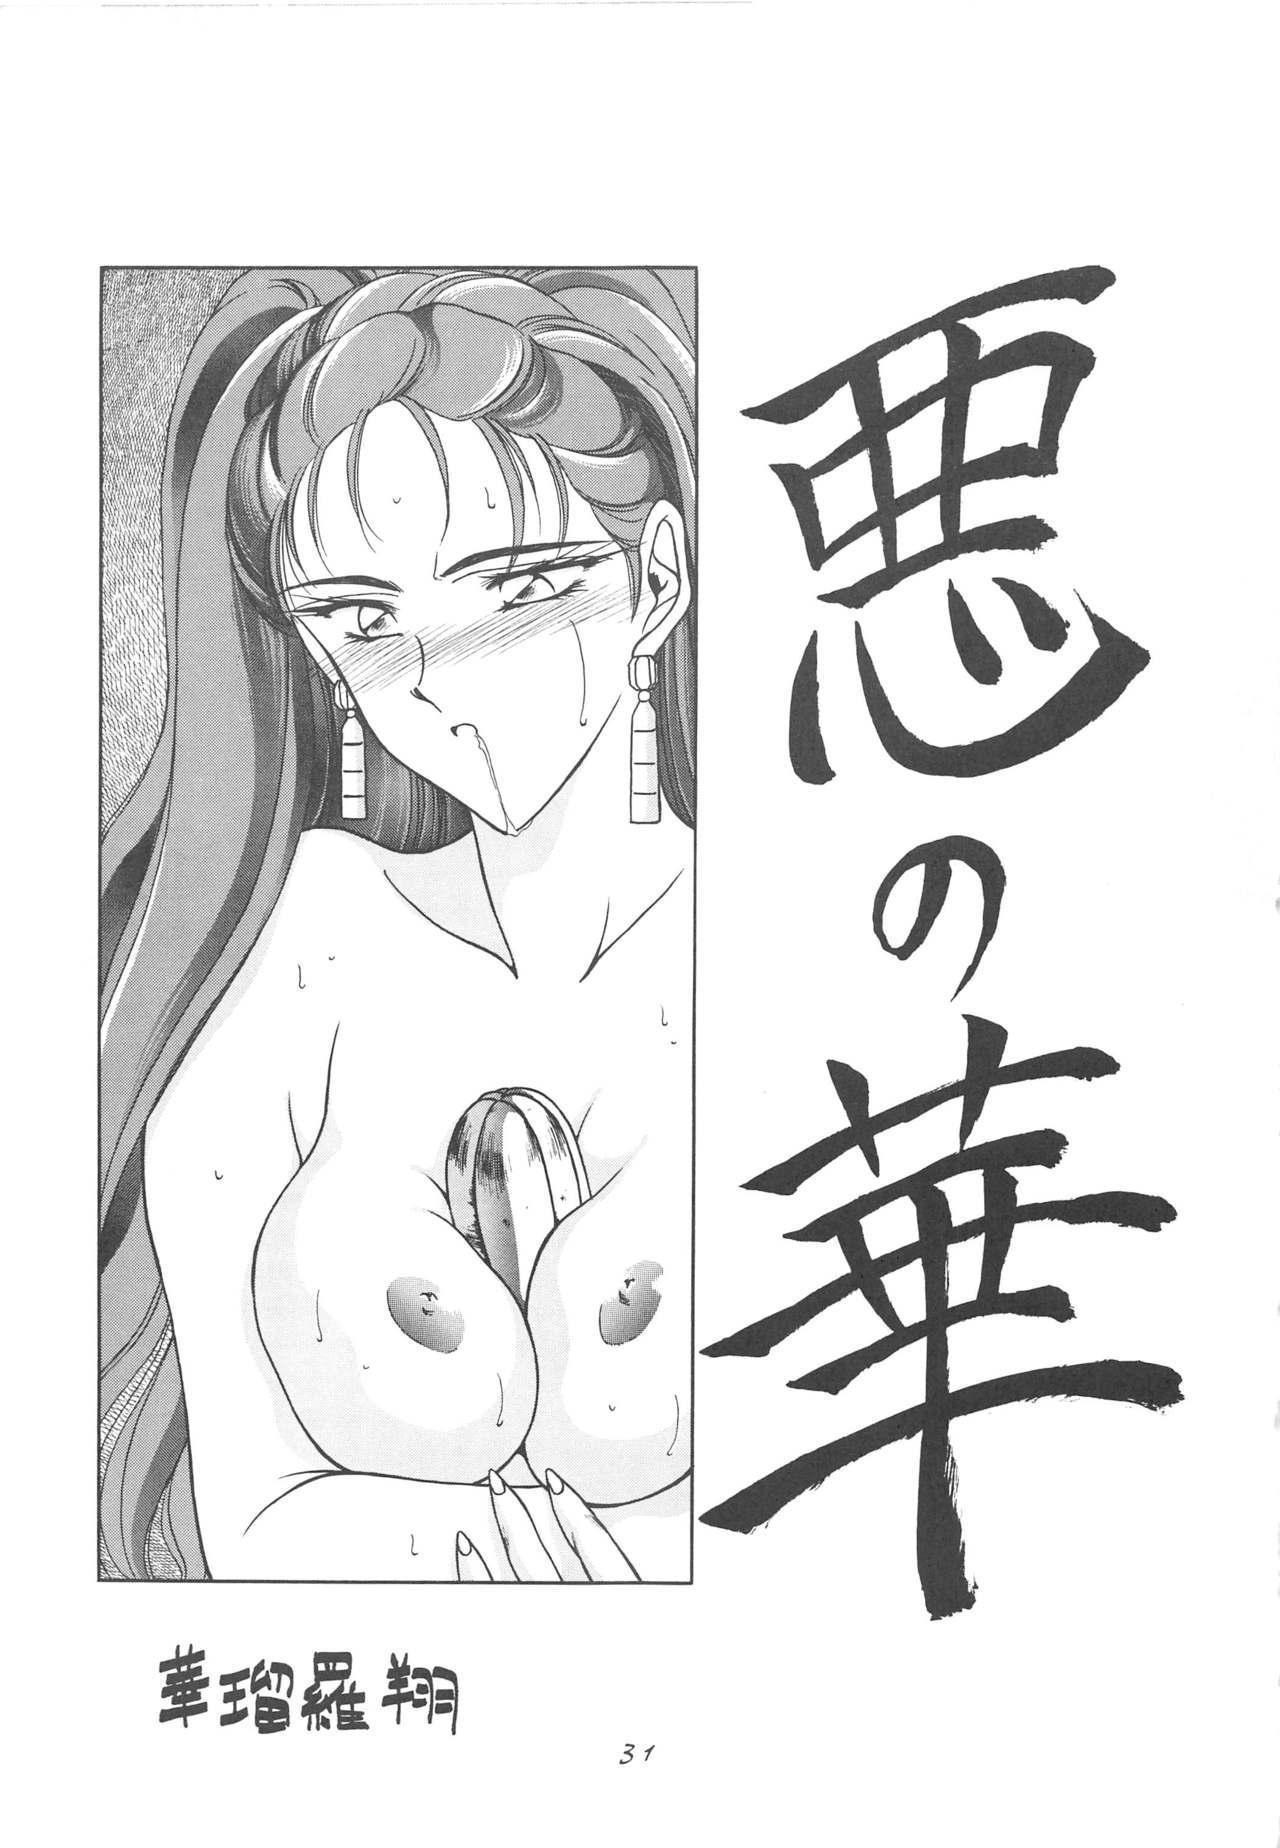 INDIVIDUAL 3 - 19930816 → 30